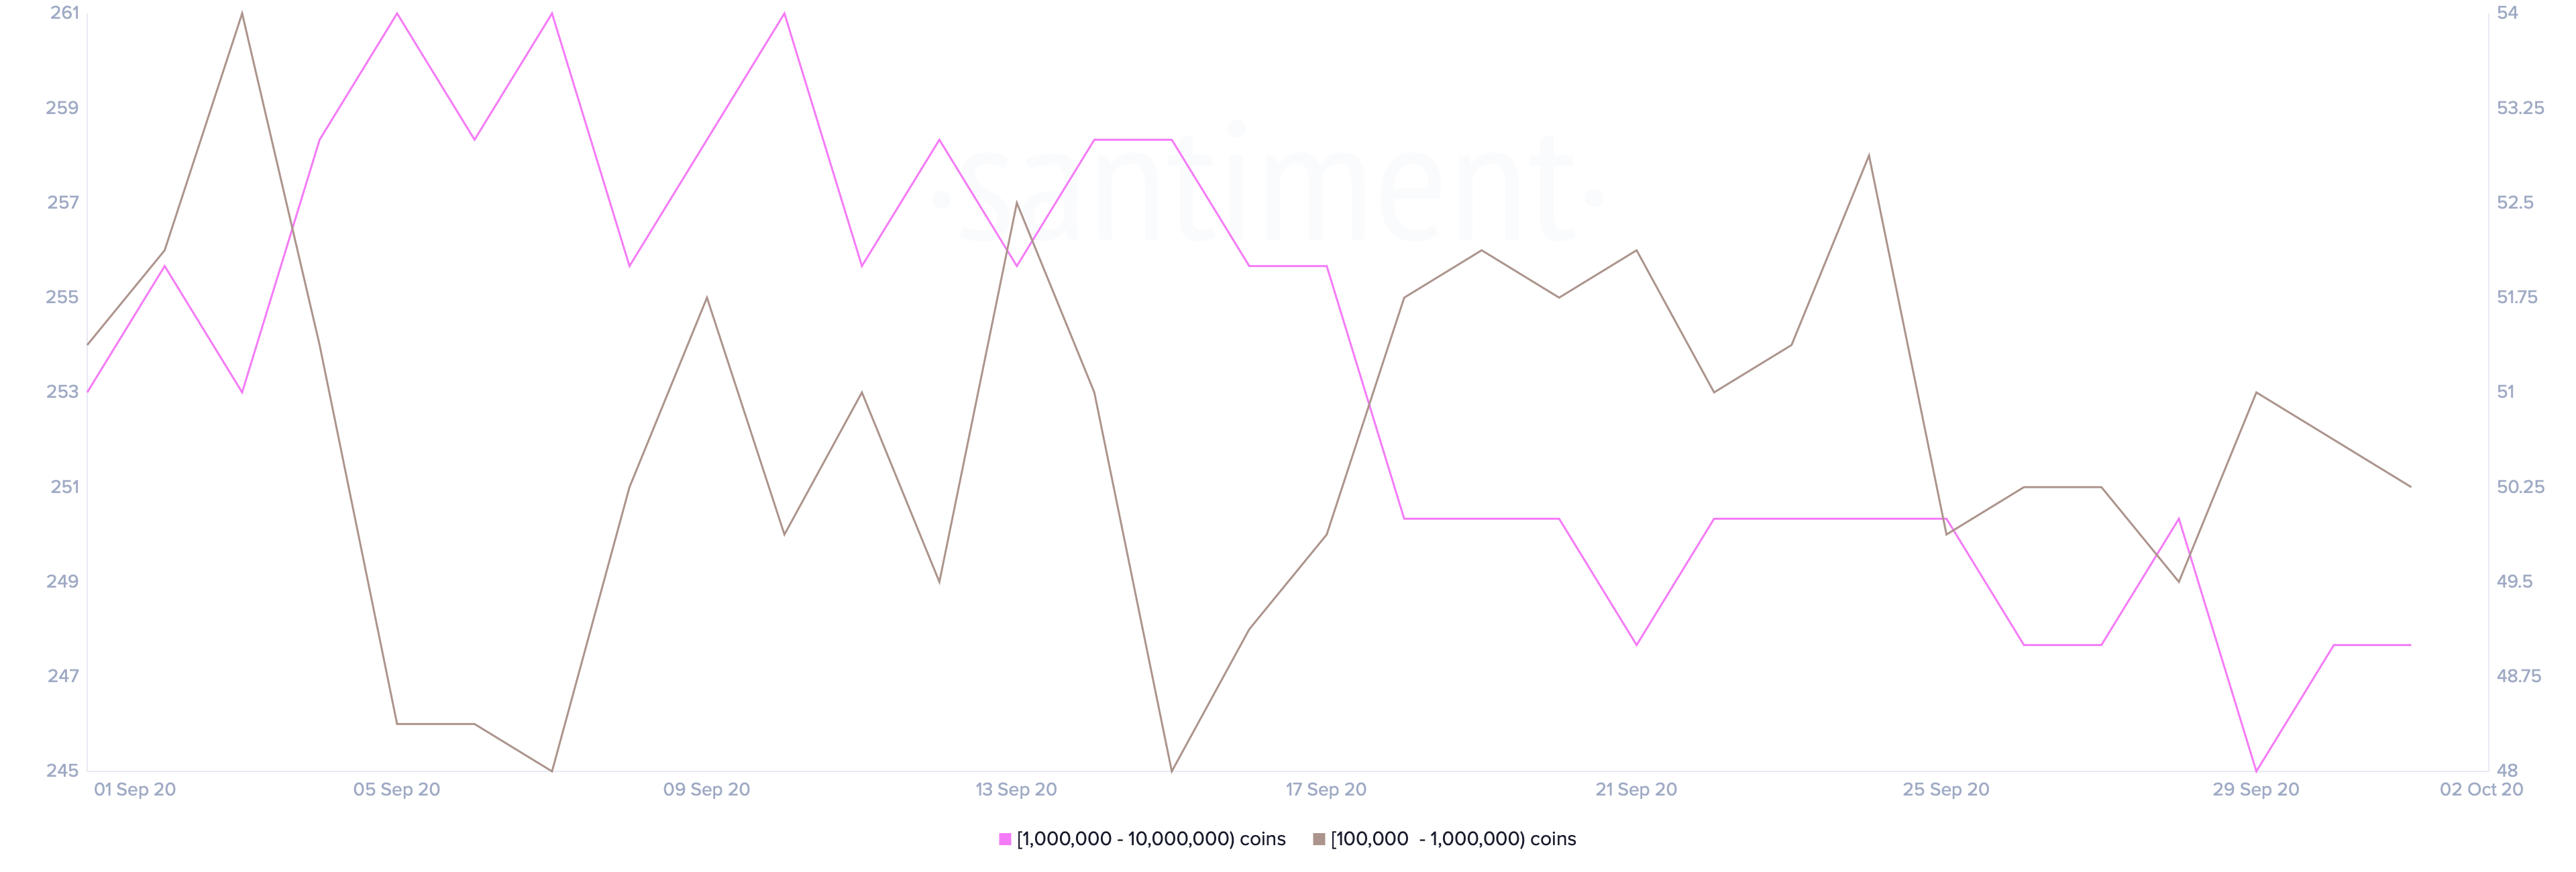 LINK Holders Distribution by Santiment